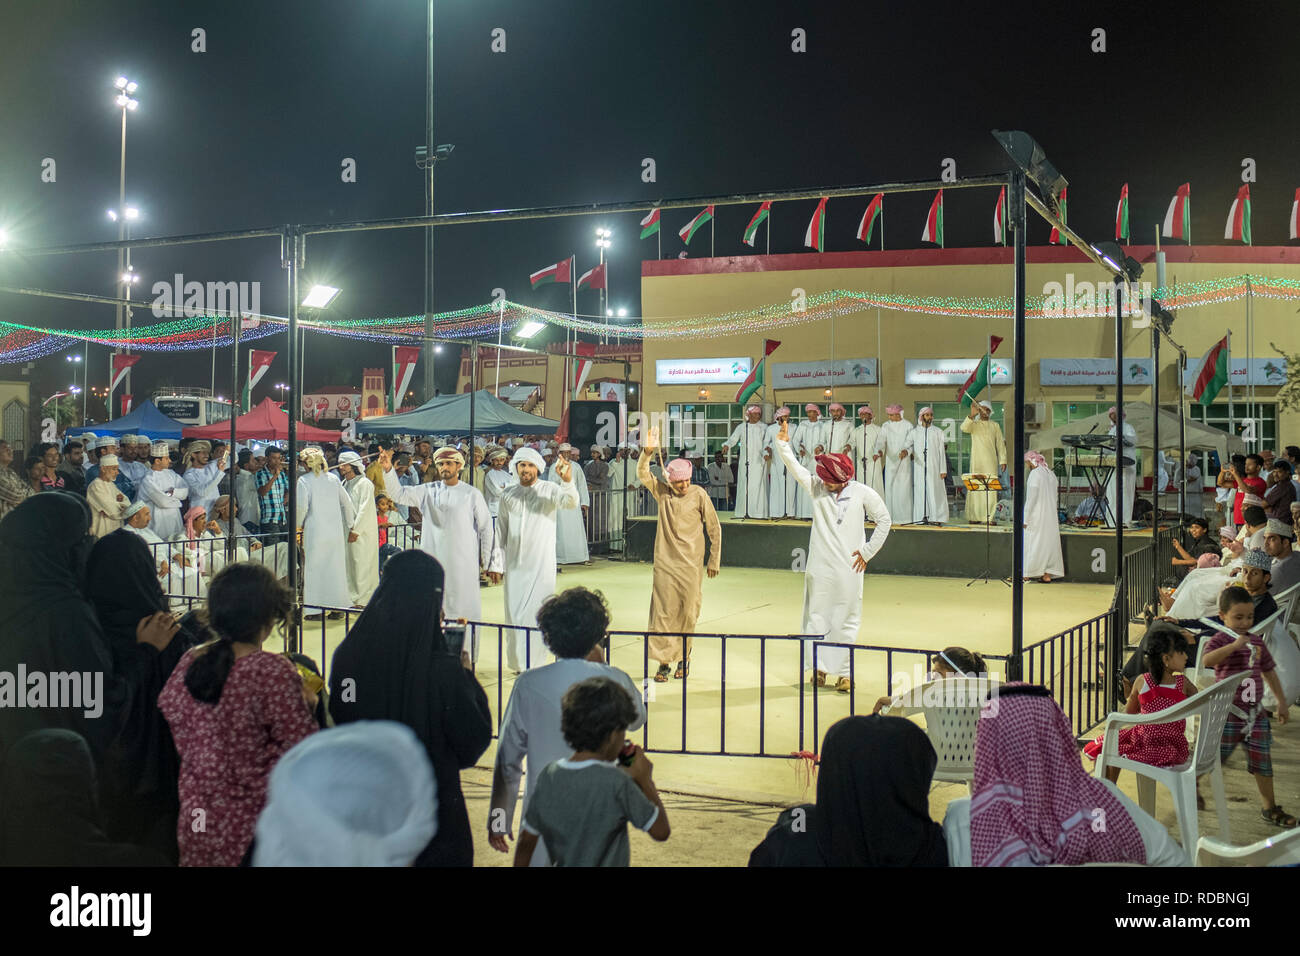 Omani Dress Stock Photos & Omani Dress Stock Images - Alamy